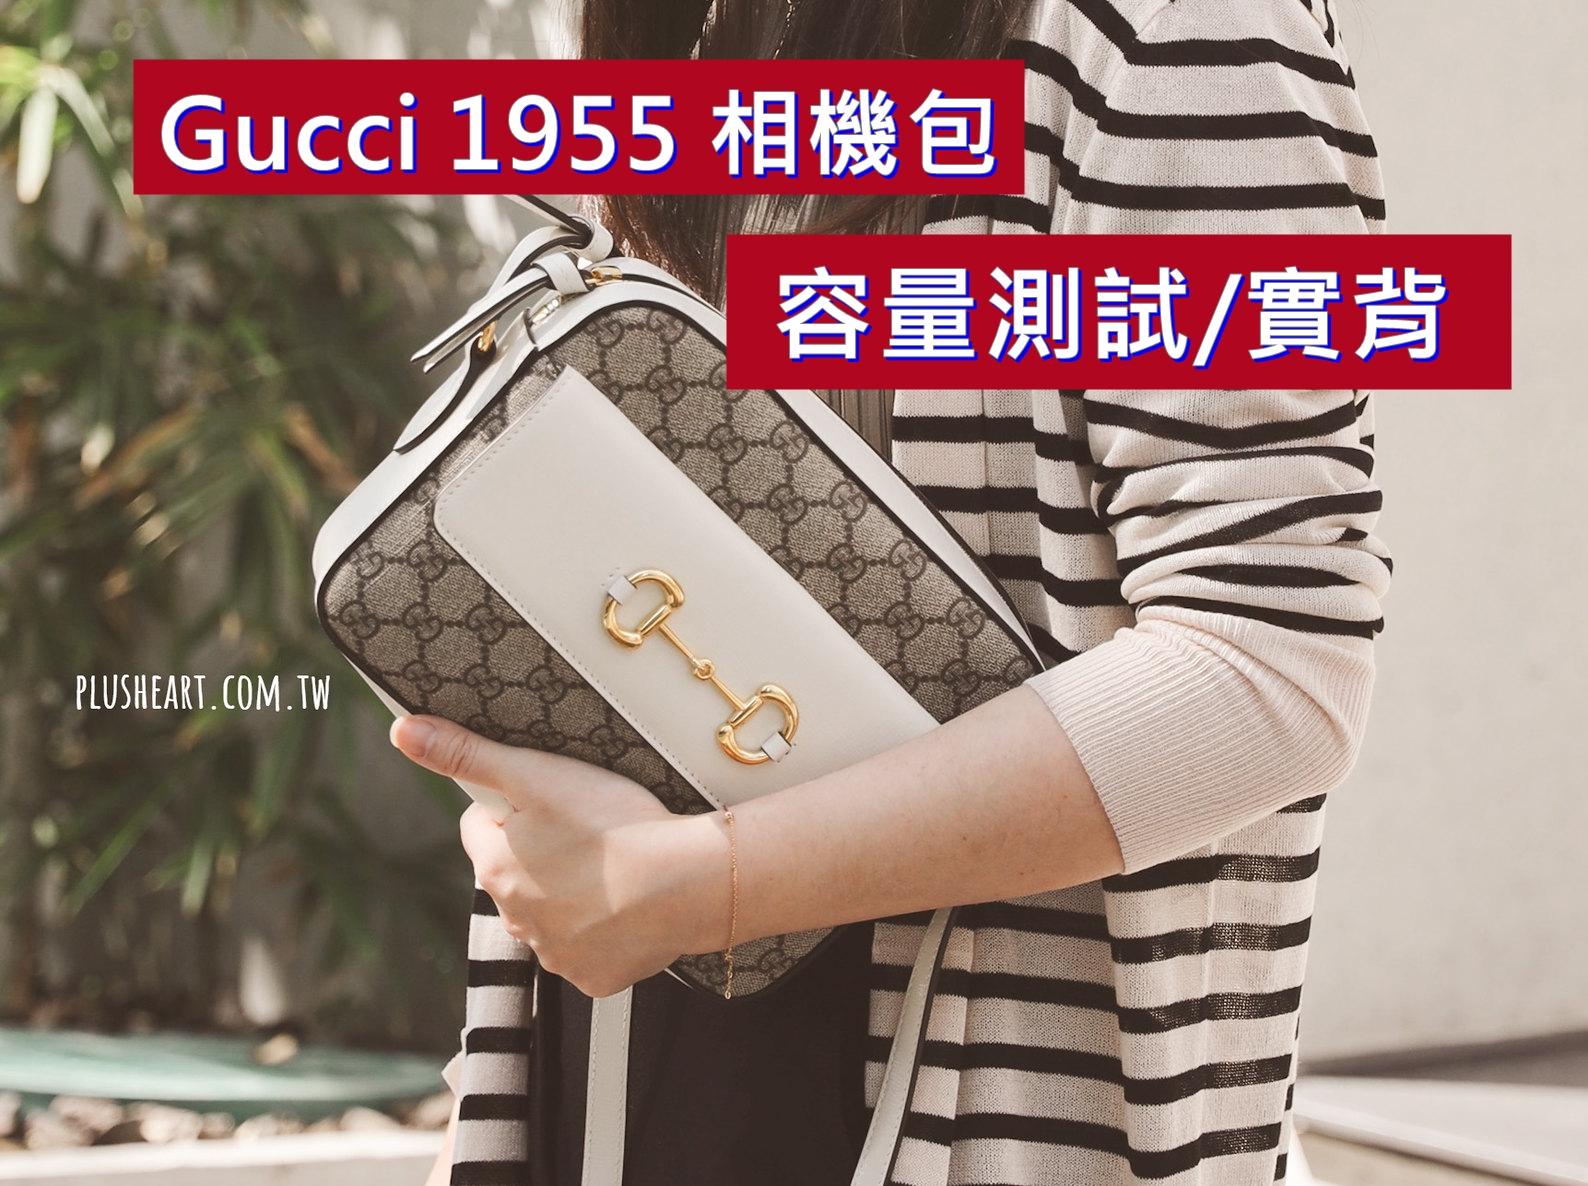 Gucci 1955 small shoulder bag肩背包/相機包容量測試/實背影片